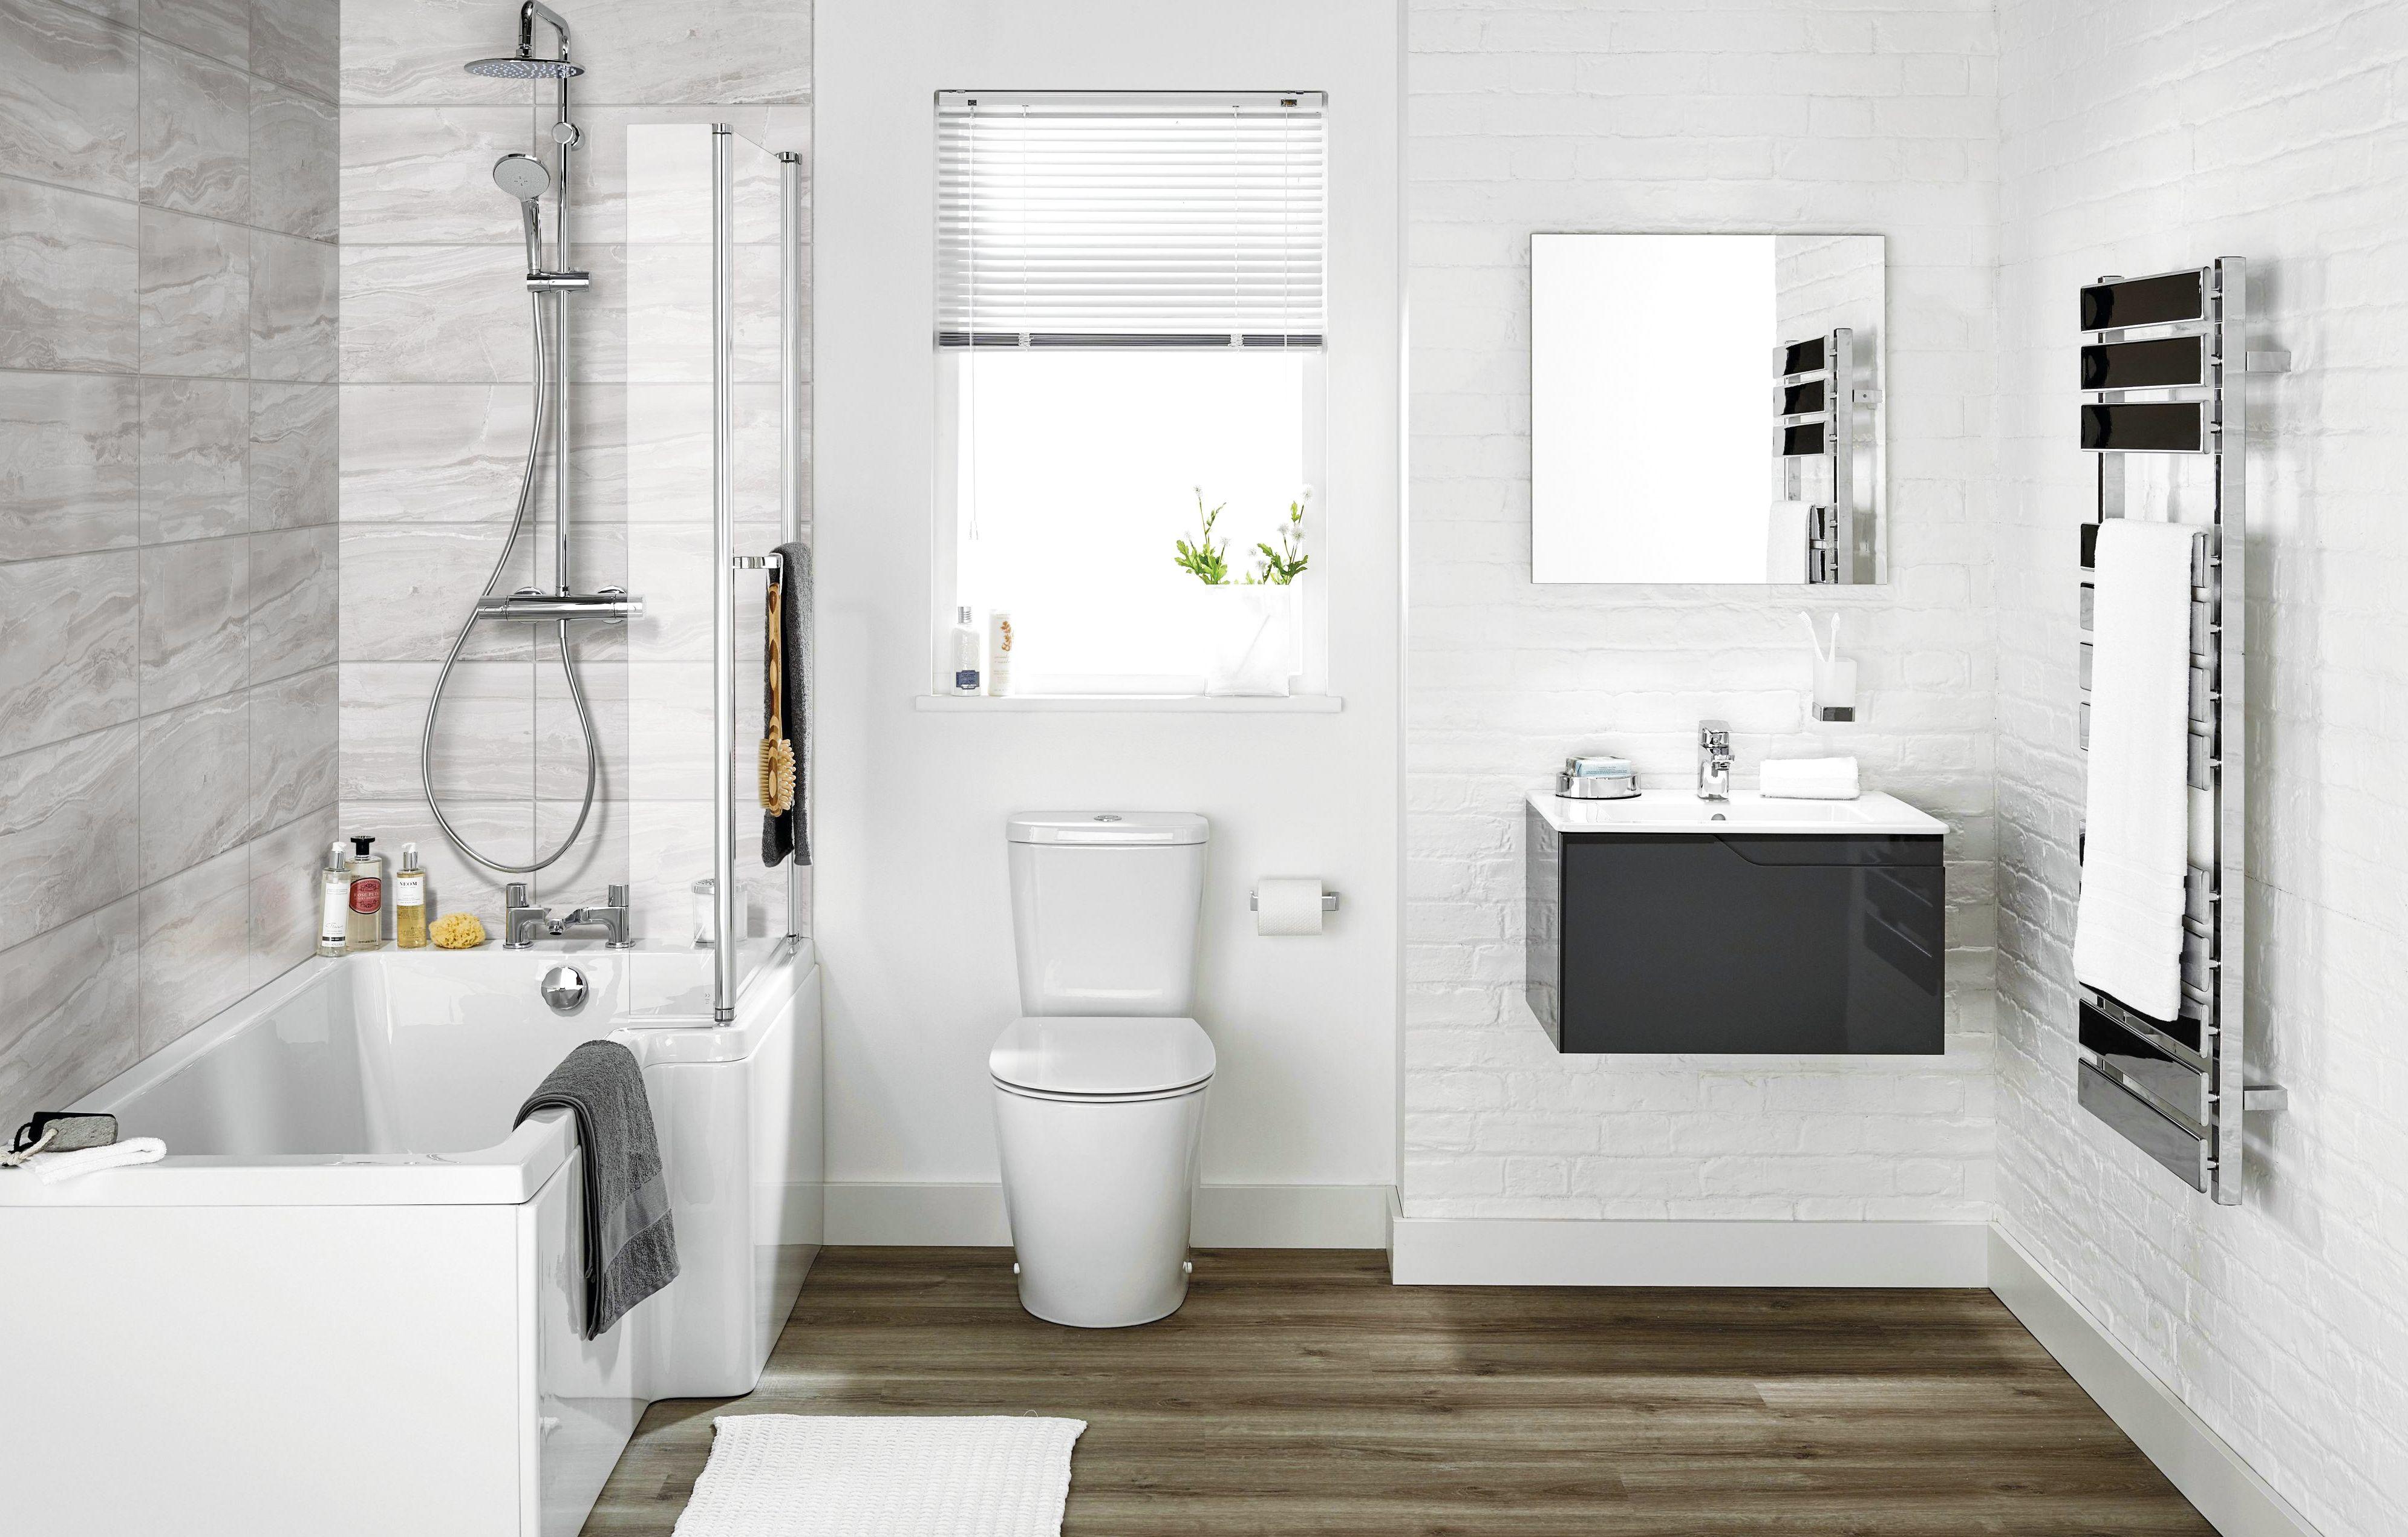 Imagine modern bathroom suites diy at b q for Small on suite bathroom ideas